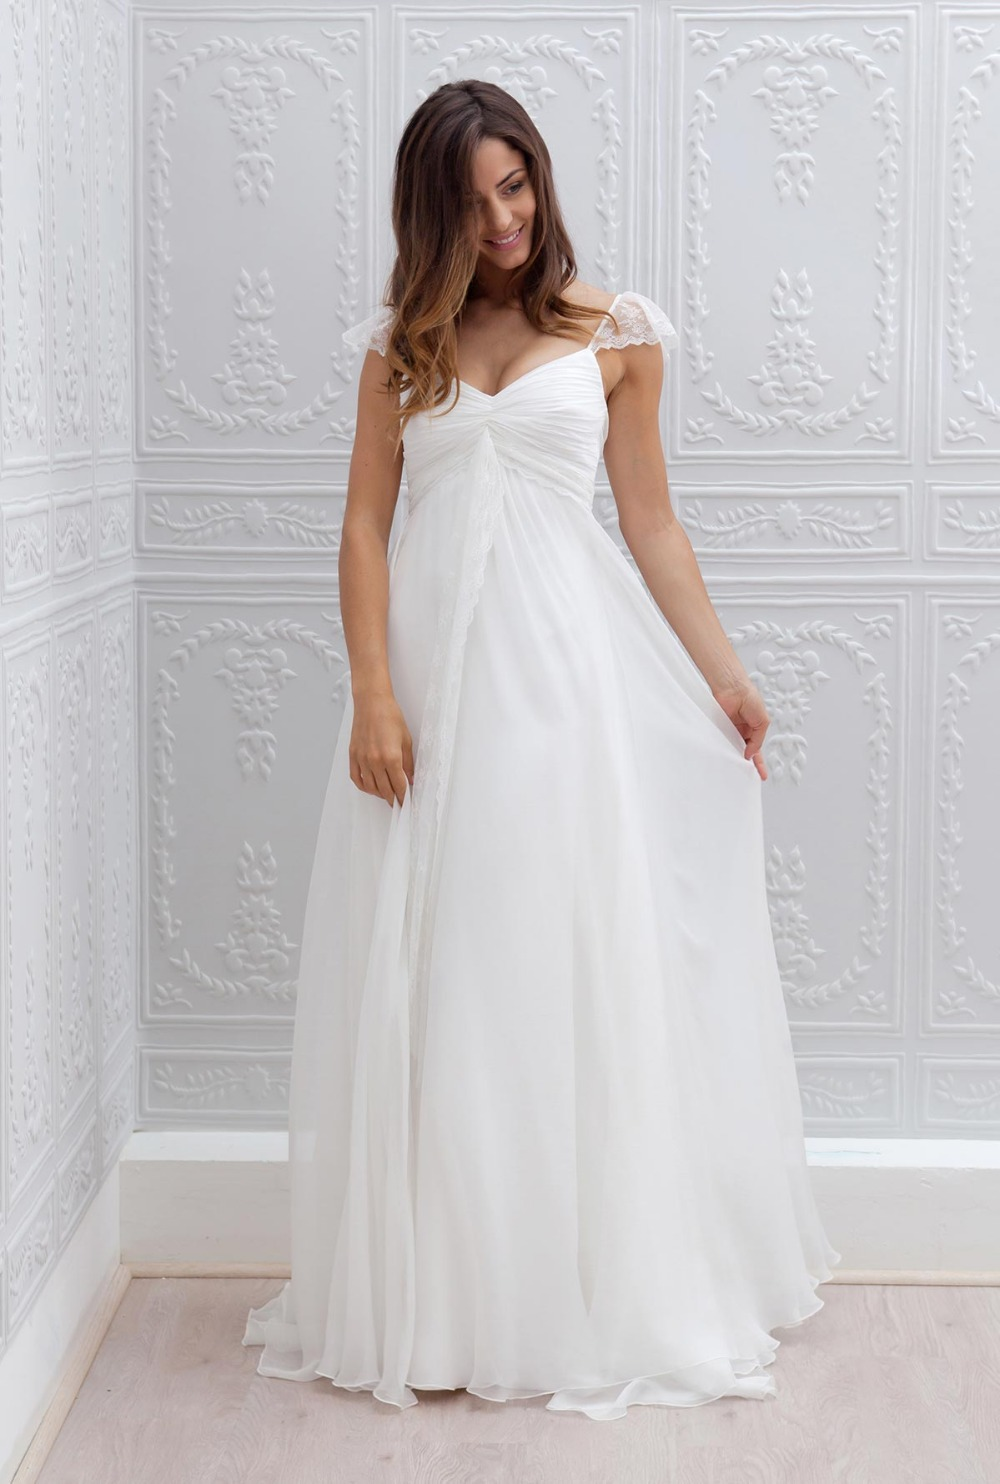 Popular wedding dresses maternity buy cheap wedding for Long sleeve lace maternity wedding dress